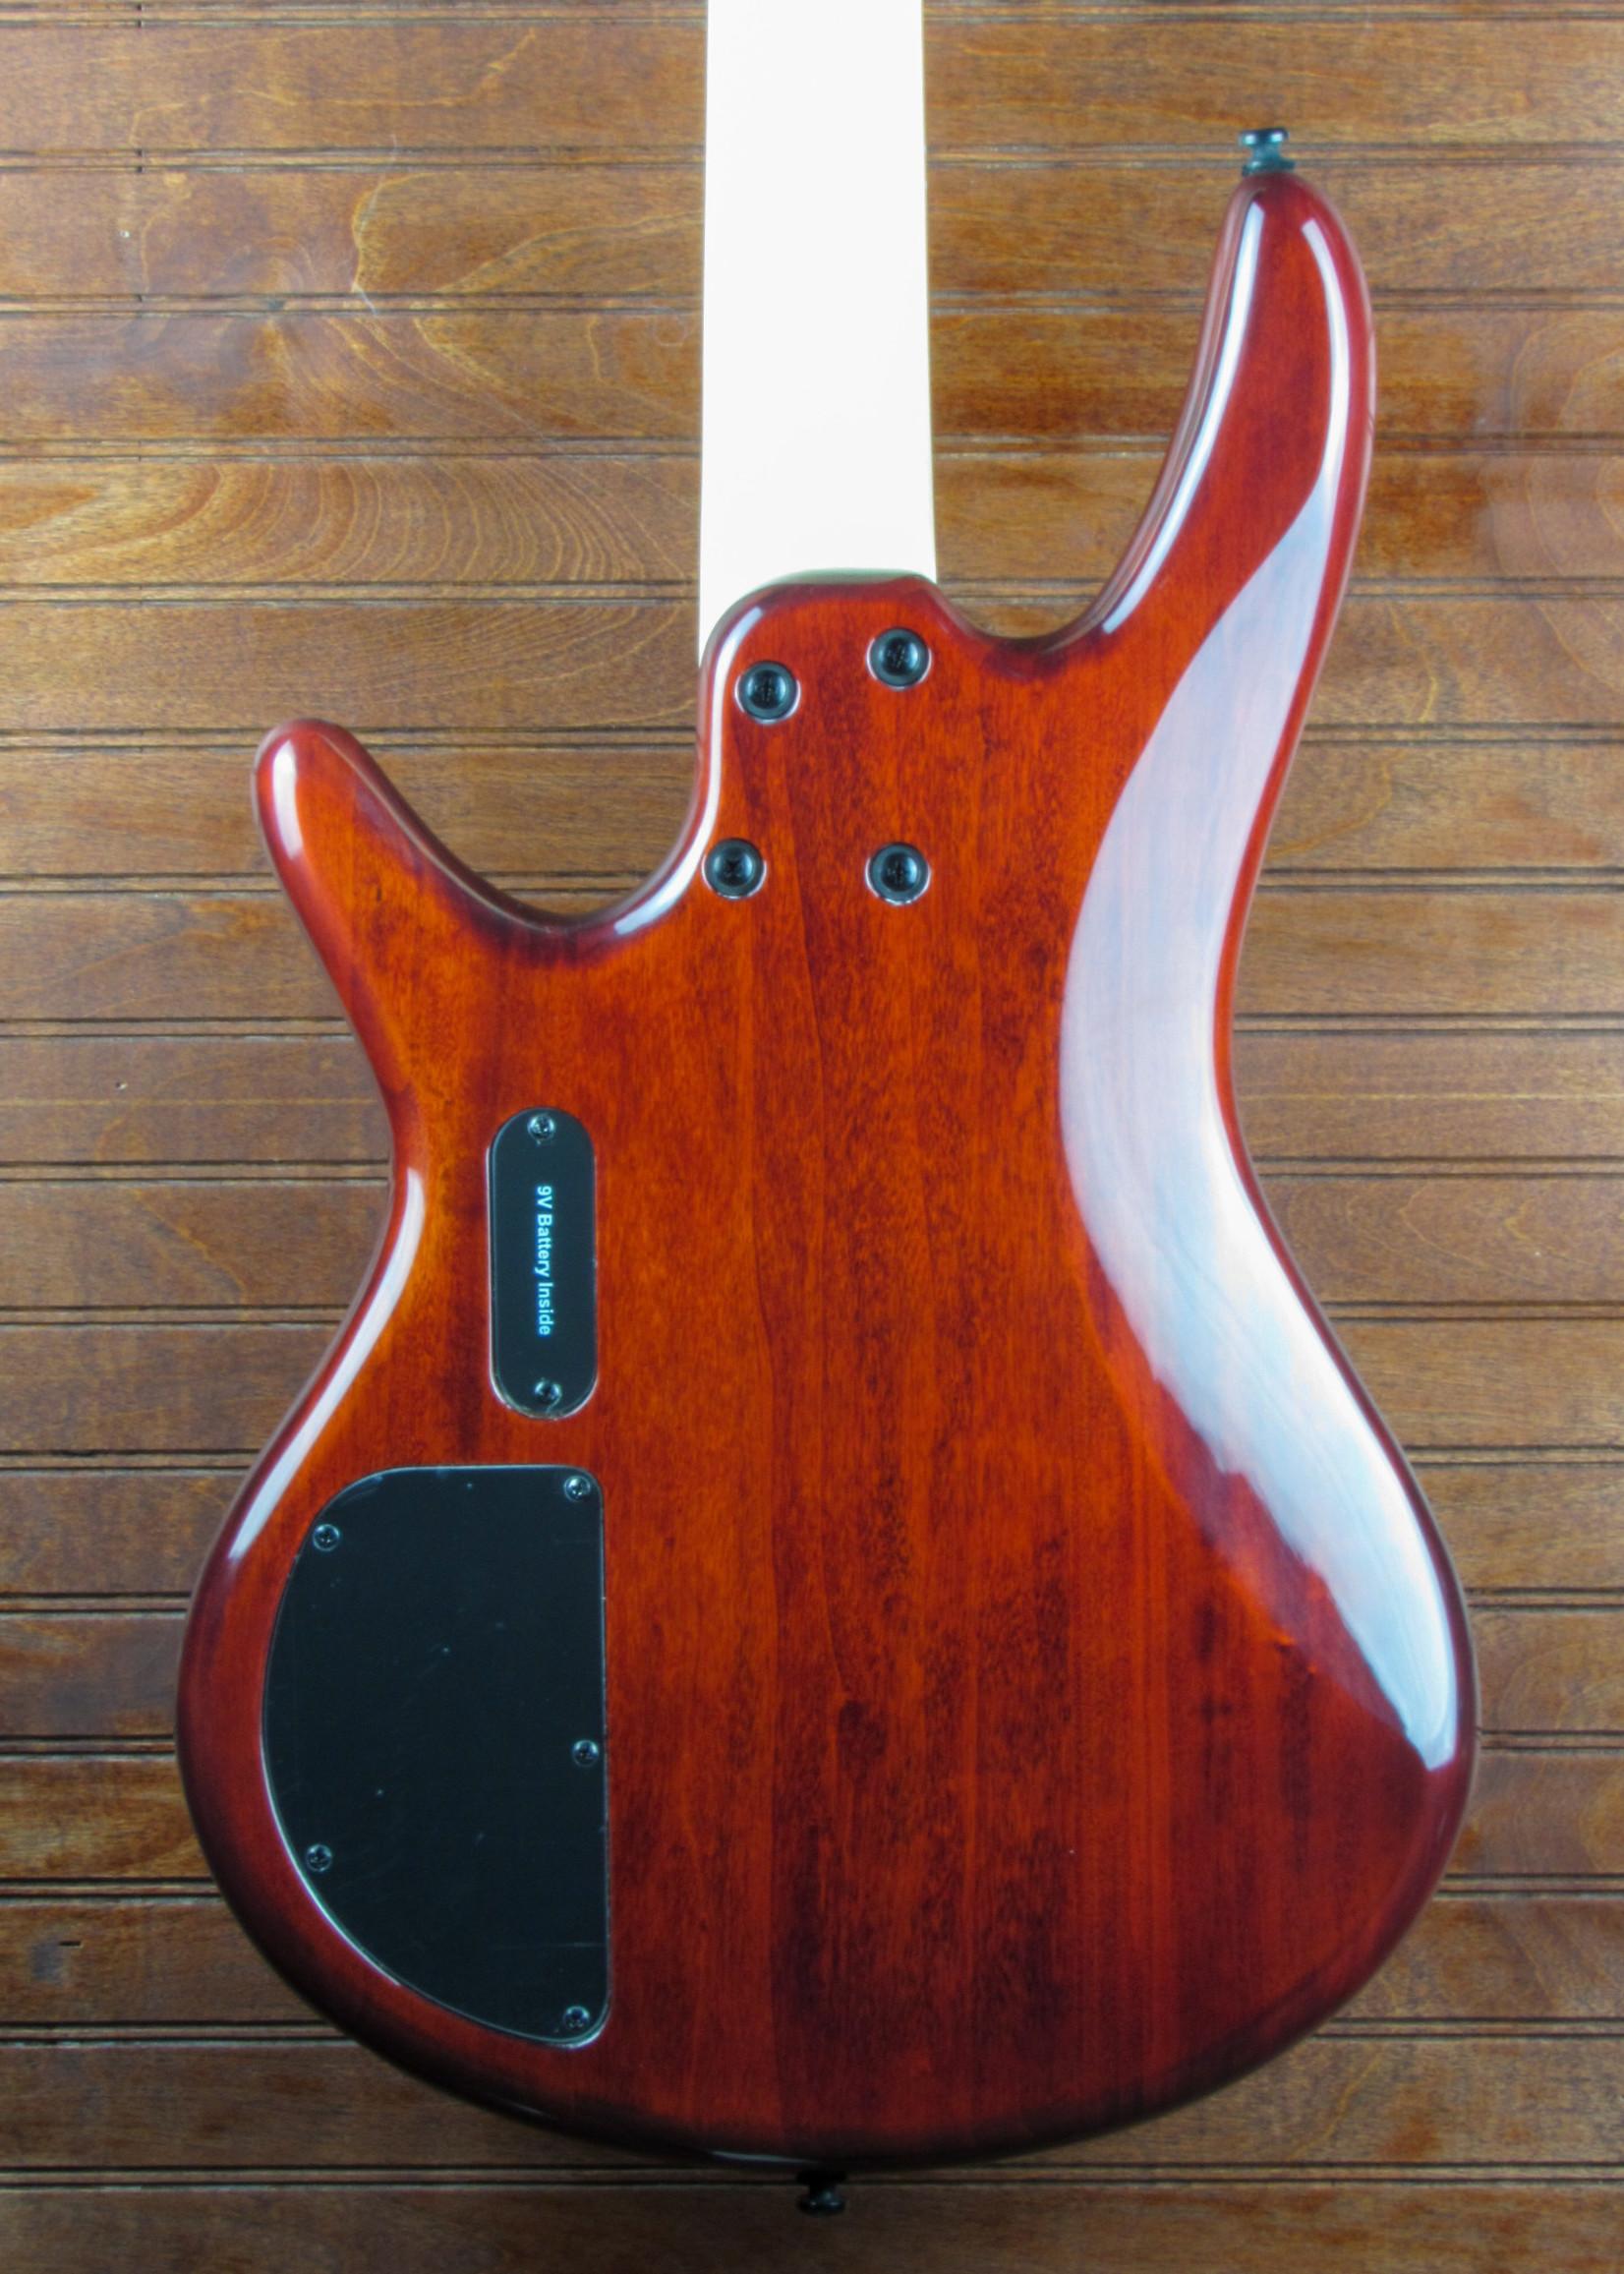 Ibanez Ibanez GSR200 Transparent Red